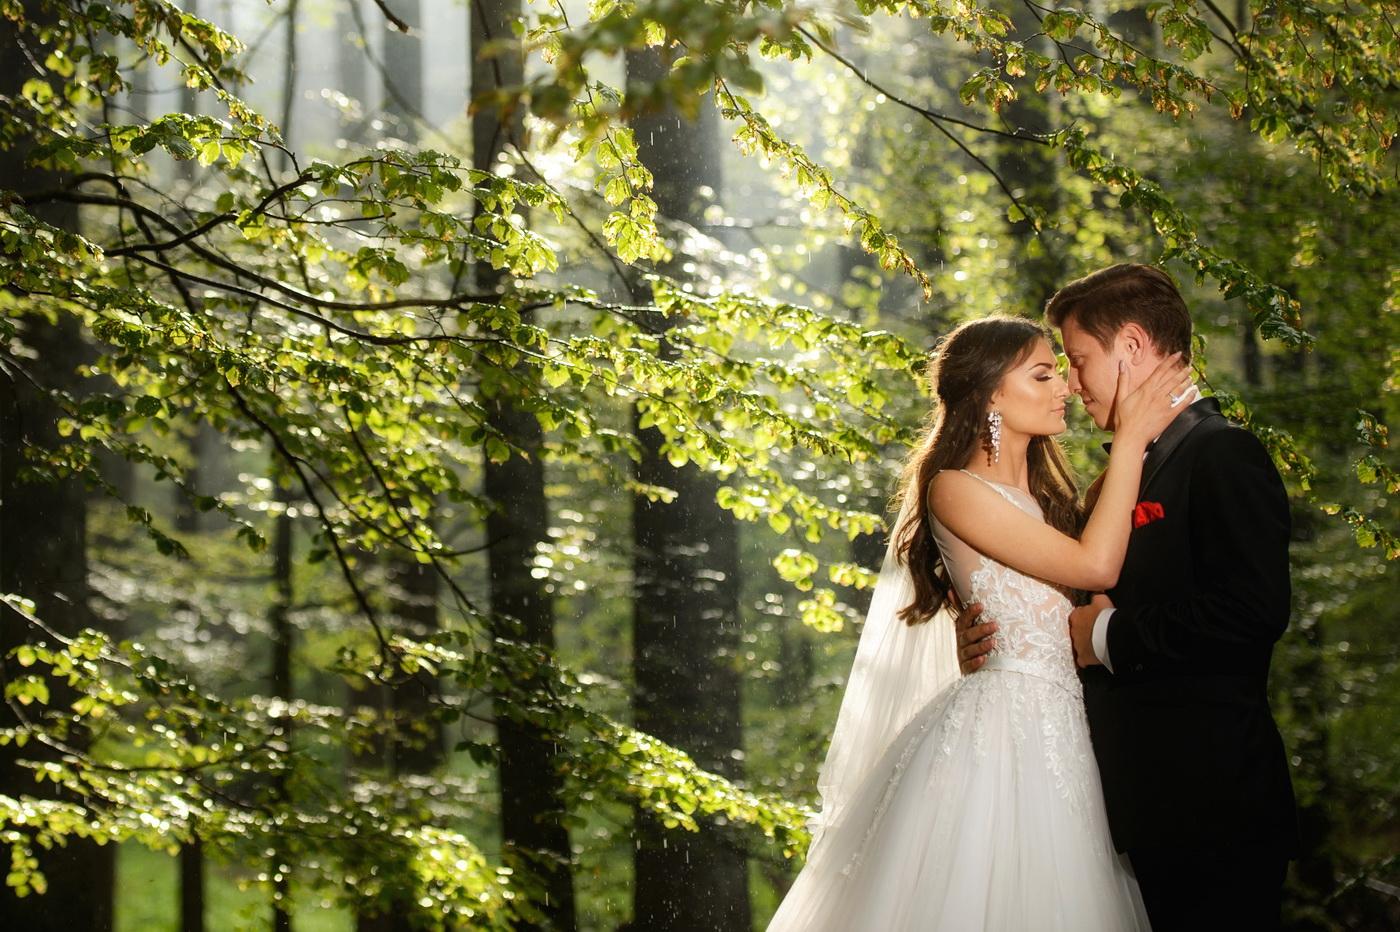 Destination Wedding Photographer_Marian Sterea_212.jpg